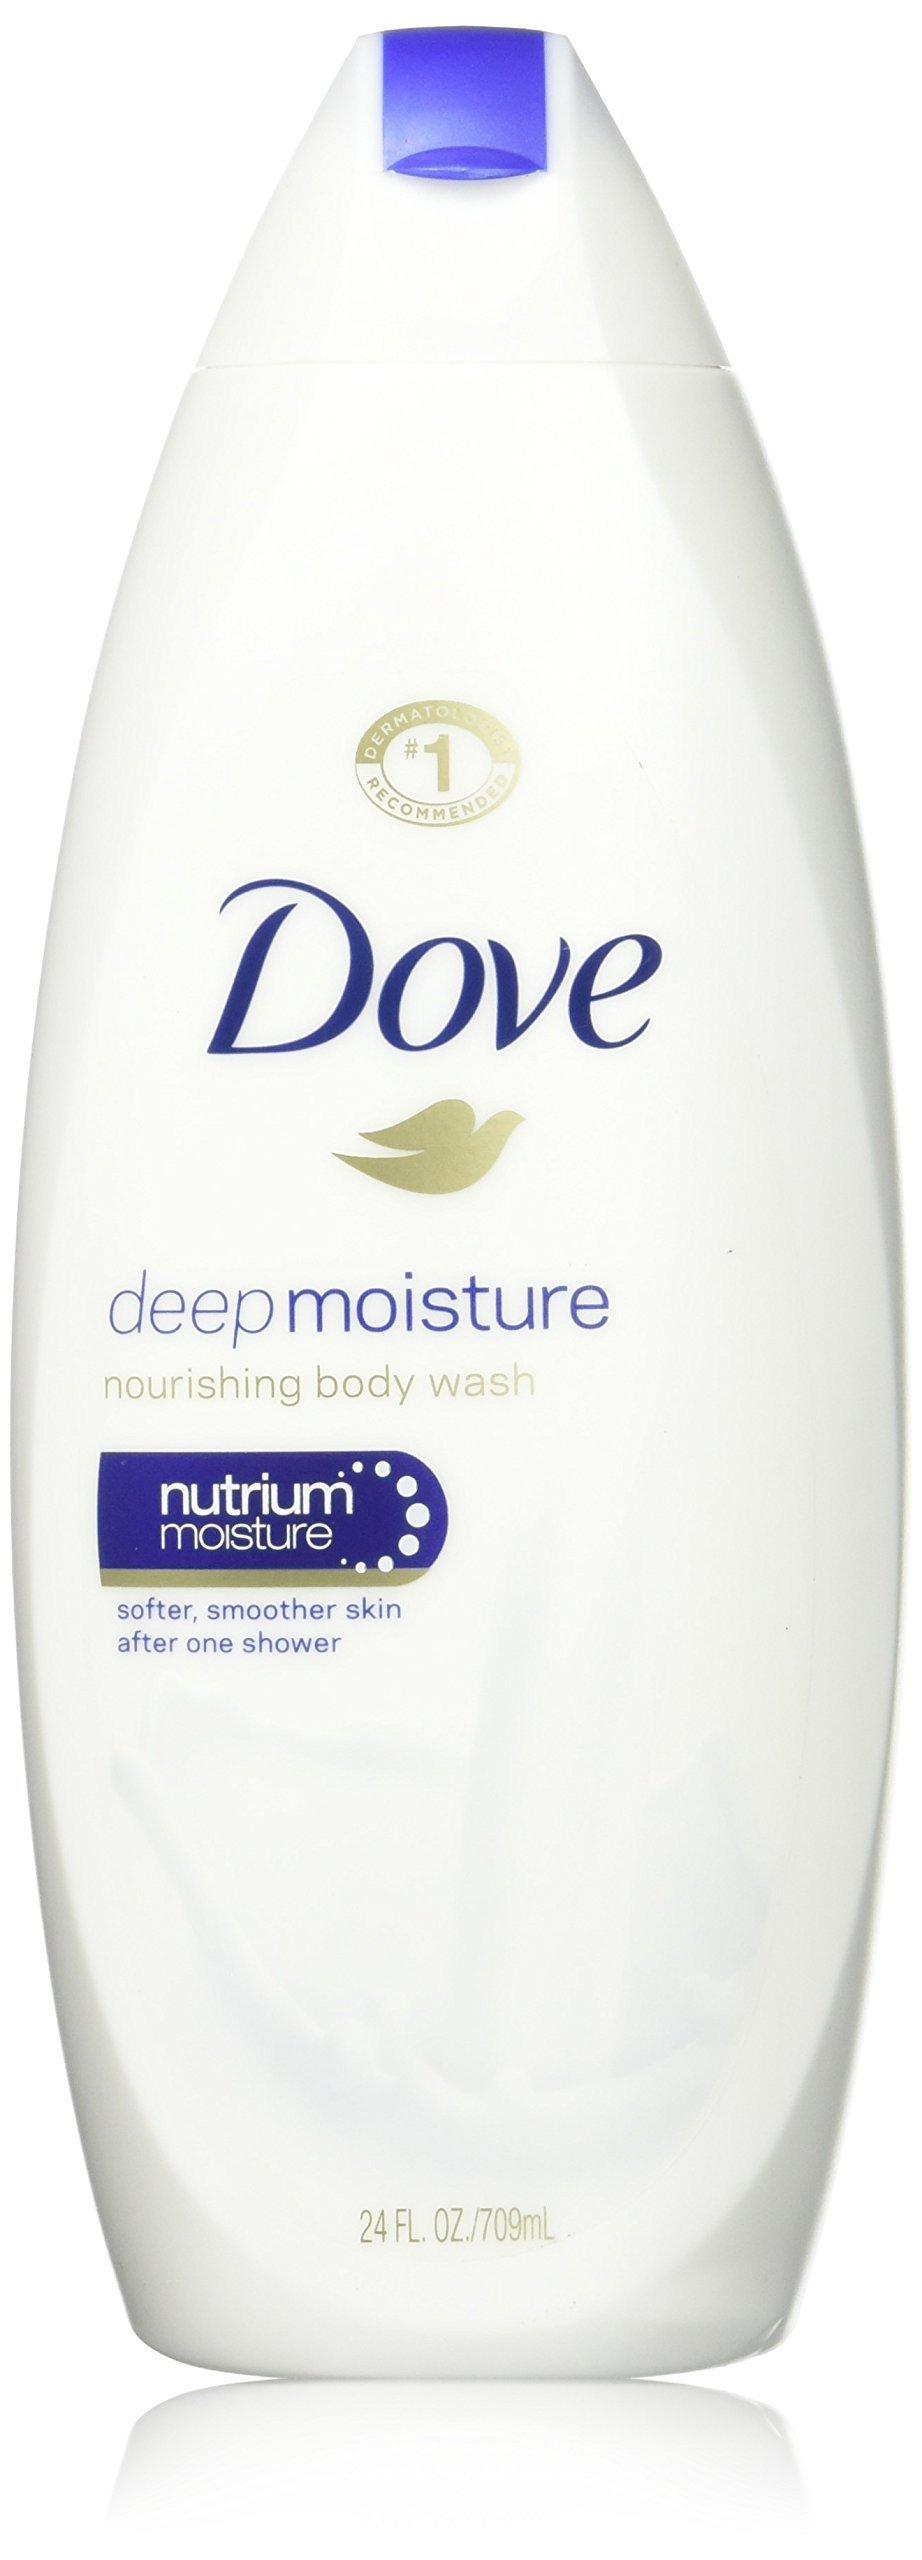 Dove, Deep Moisture Nourishing Body Wash, 24 Ounce